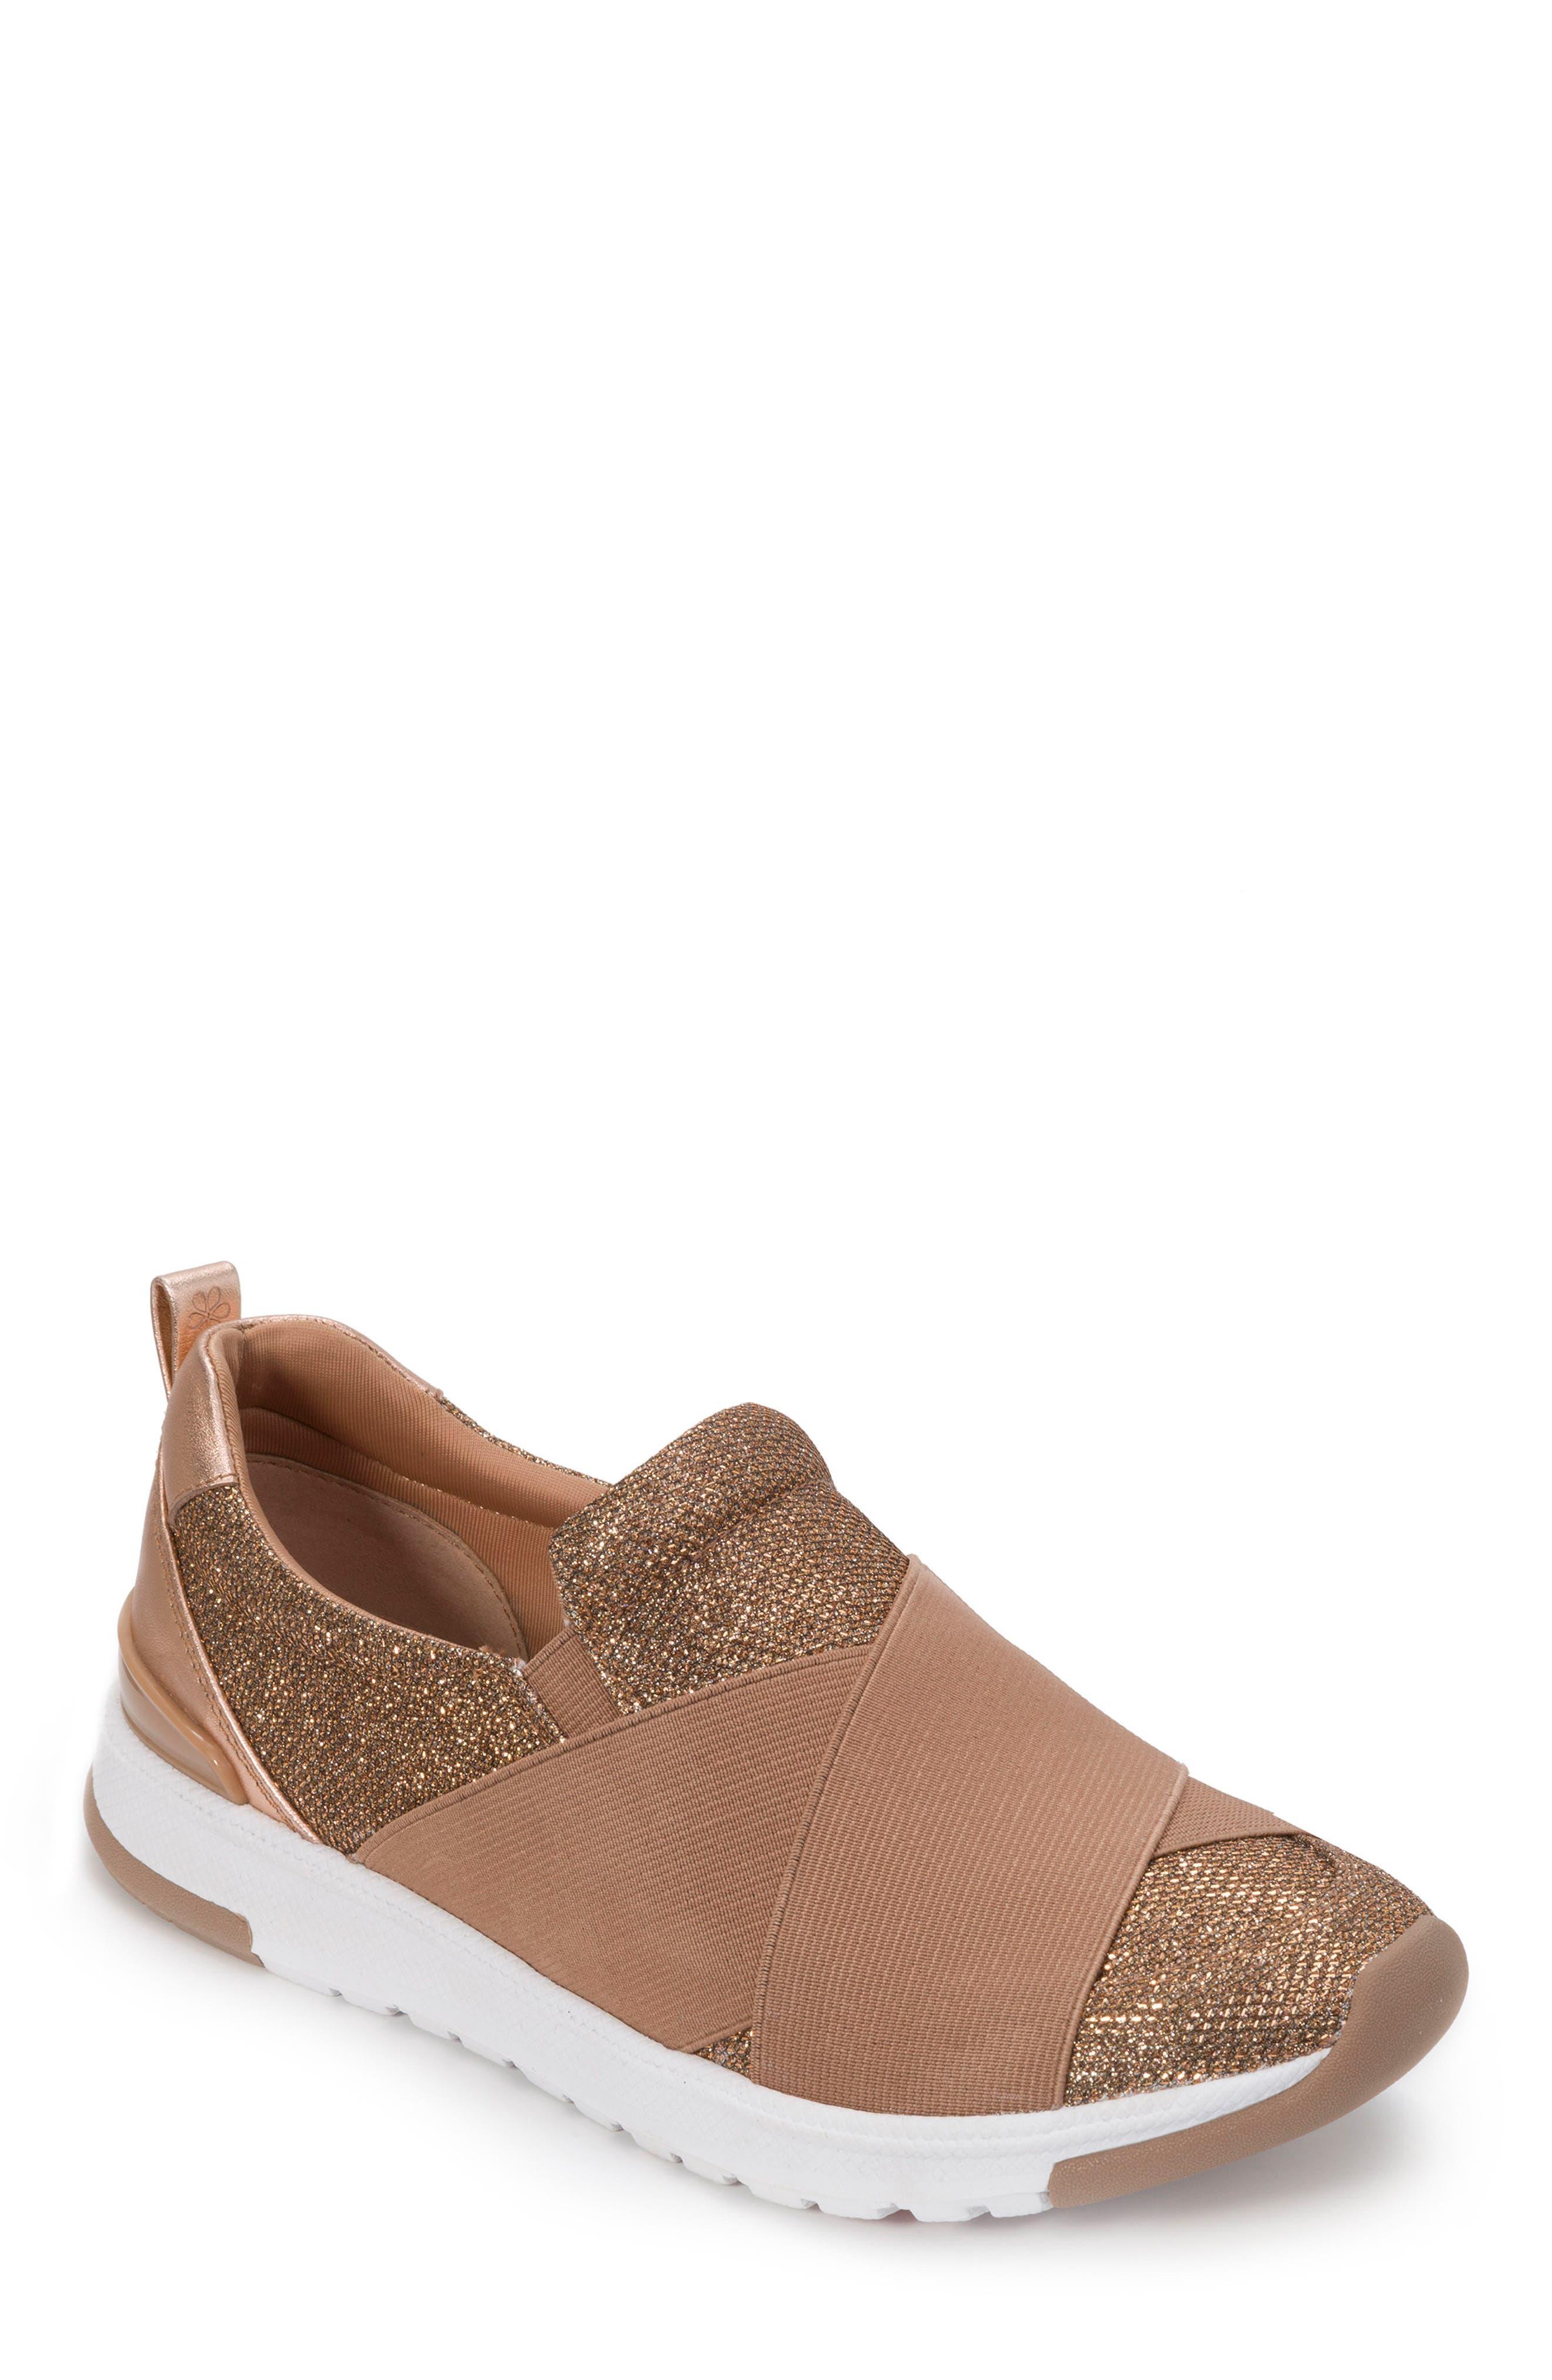 Slip-On Sneaker,                             Main thumbnail 1, color,                             Rose Gold Leather